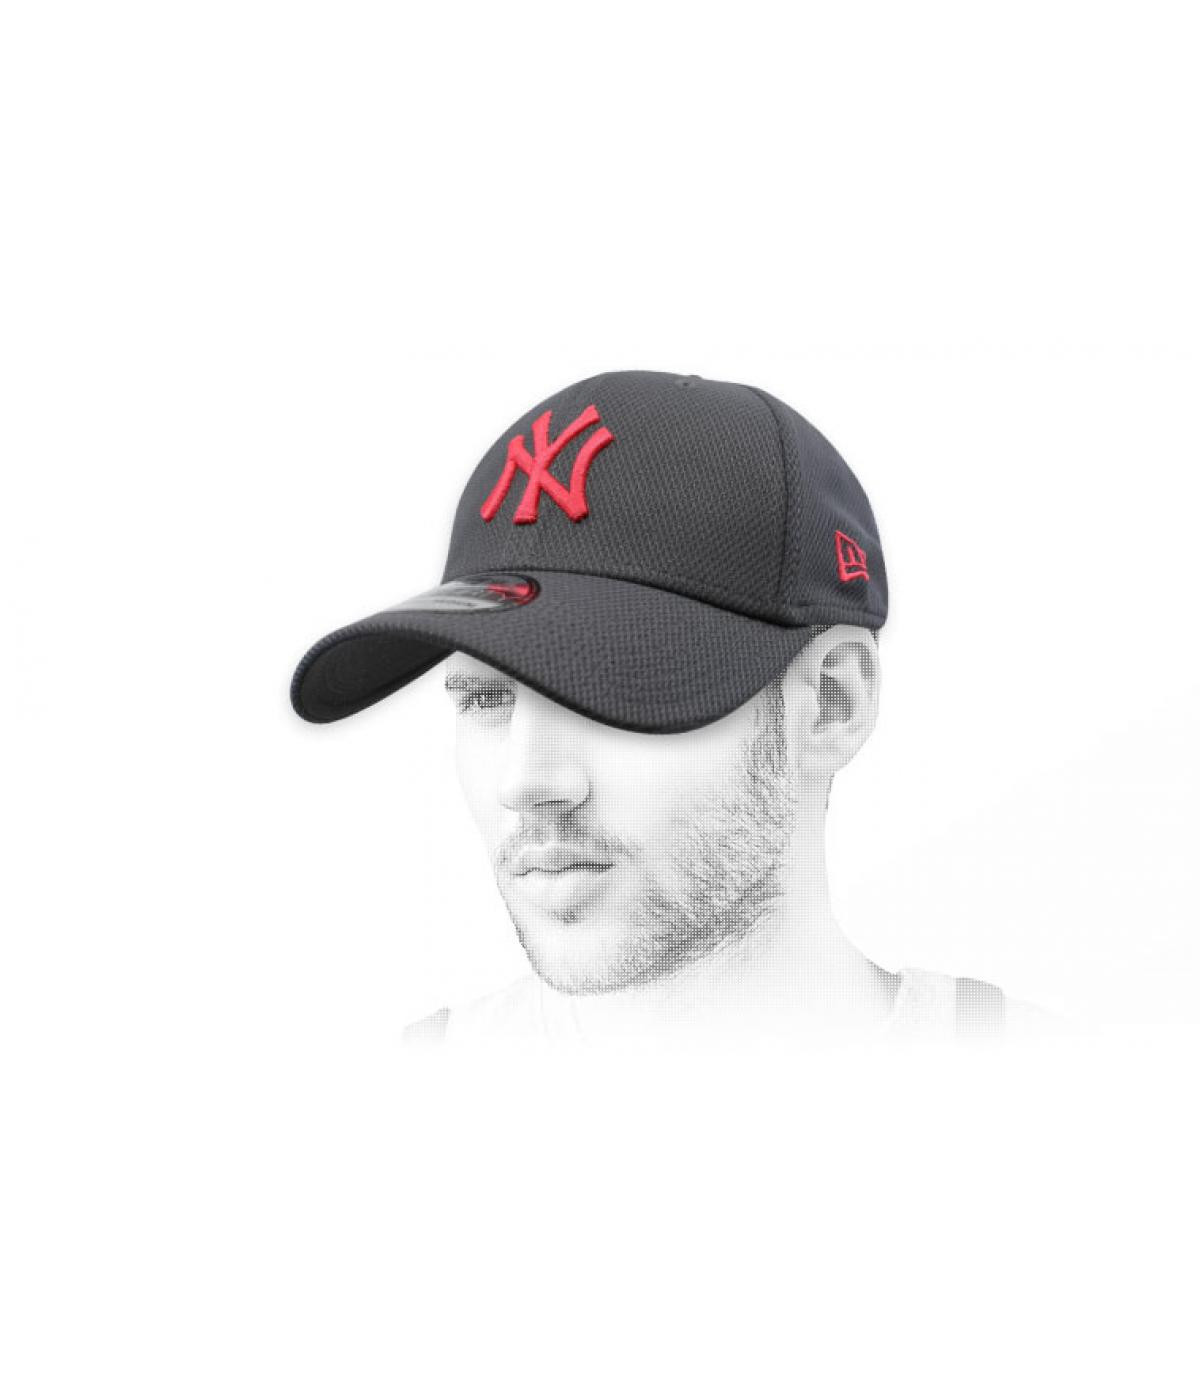 grey and red NY cap